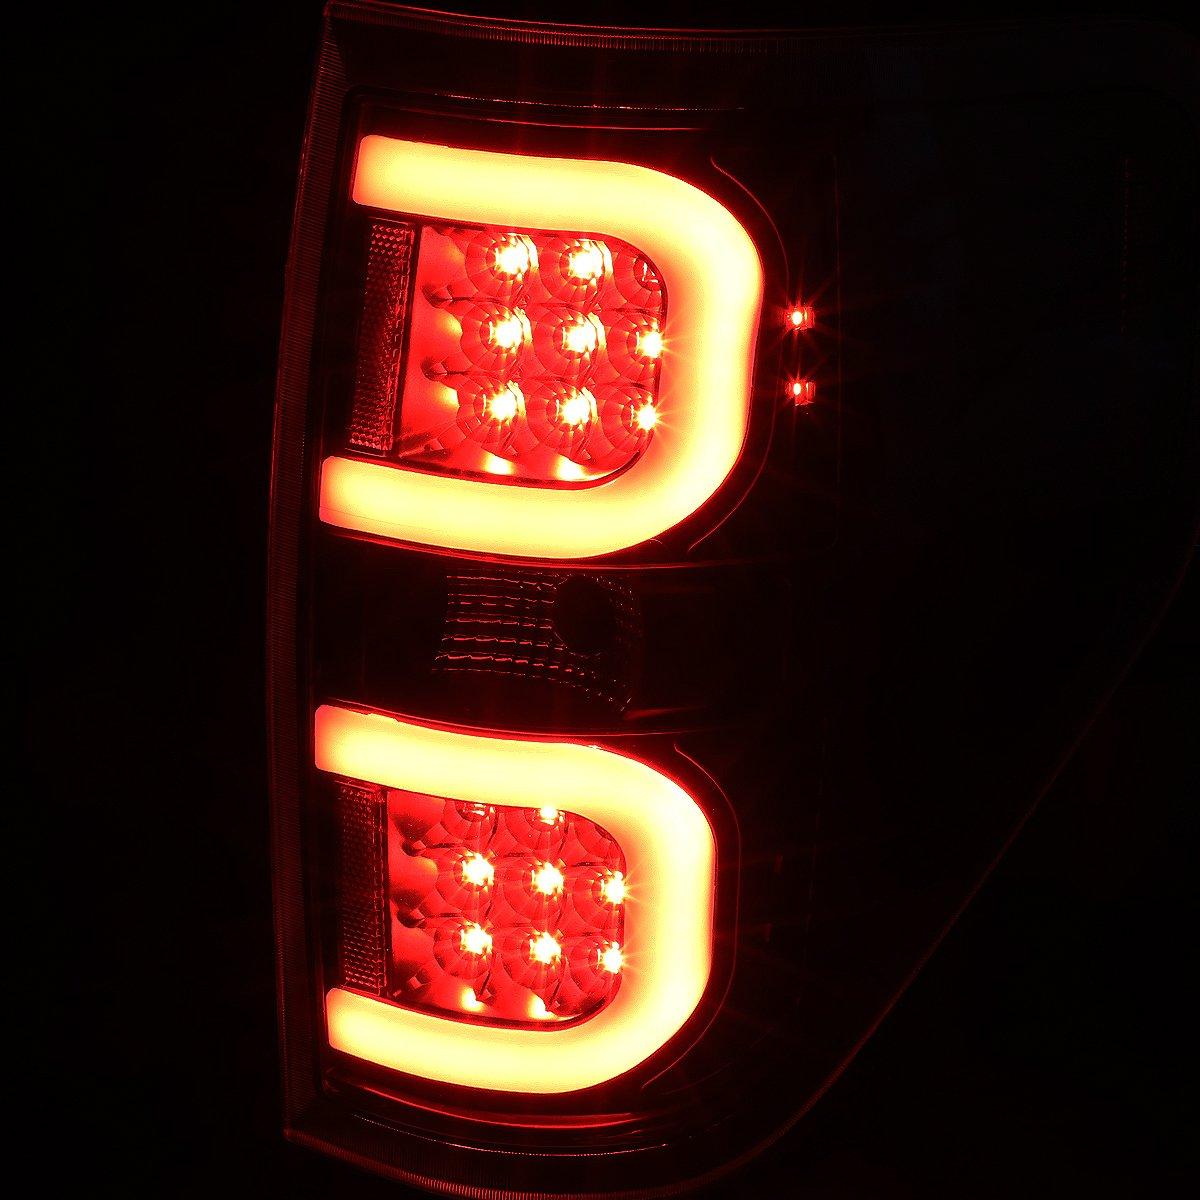 09-14 Ford F150 DNA Motoring TL-F15009-LED-RD3D-BK-SM Dual RED LED C-Bar Tail Light Black//Smoked